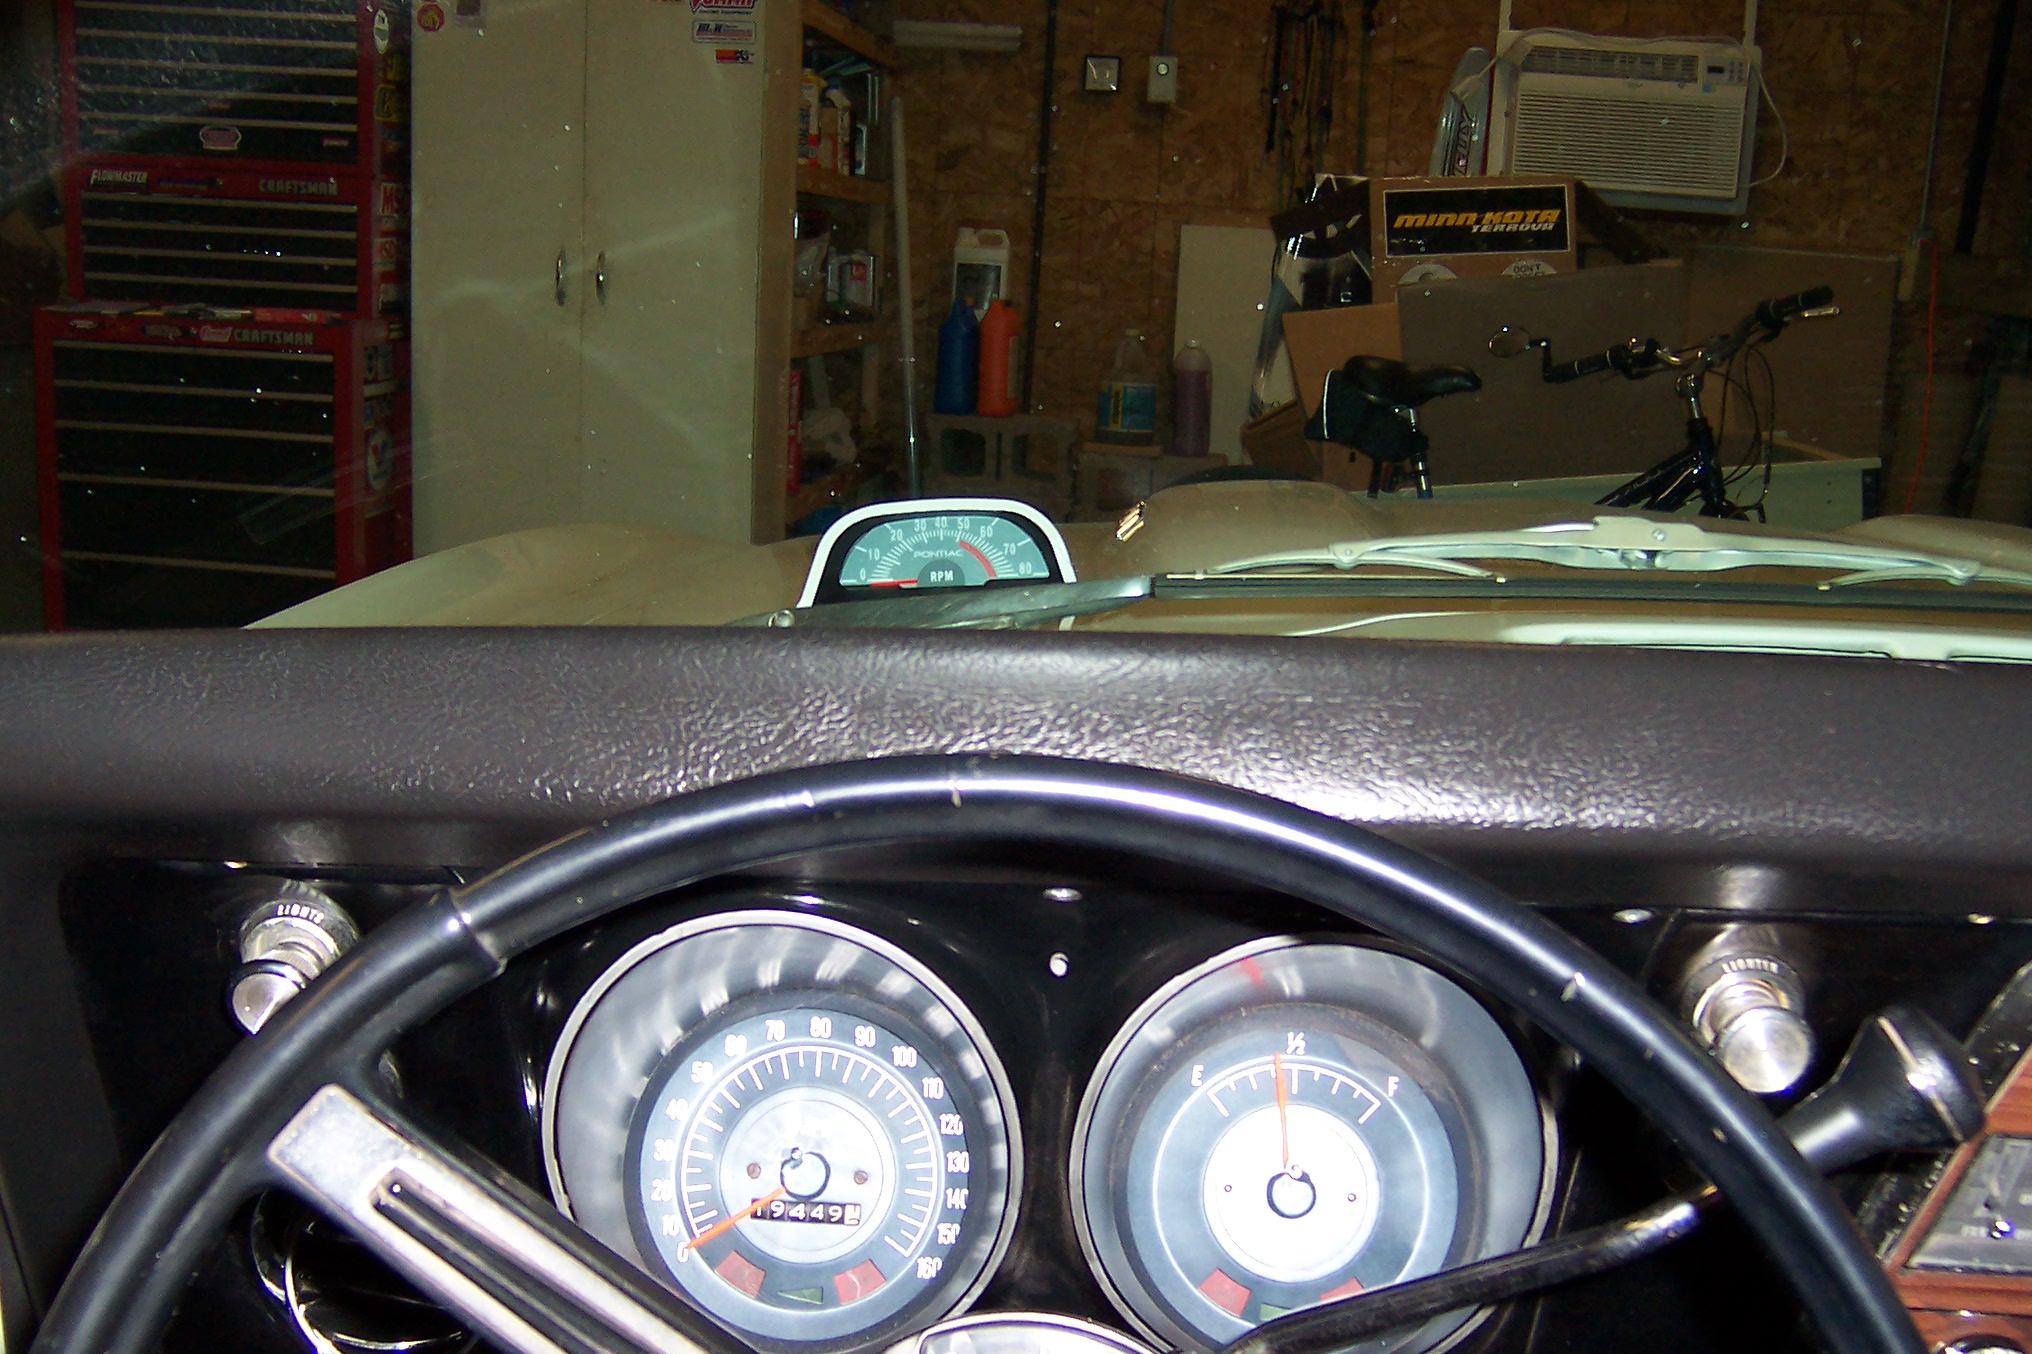 [EQHS_1162]  MS_4600] Buick Hood Tach Wiring Diagram Wiring Diagram | Buick Hood Tach Wiring Diagram |  | Xero Mimig Xtern Bios Attr Menia Ehir Amenti Xolia Nful Mohammedshrine  Librar Wiring 101